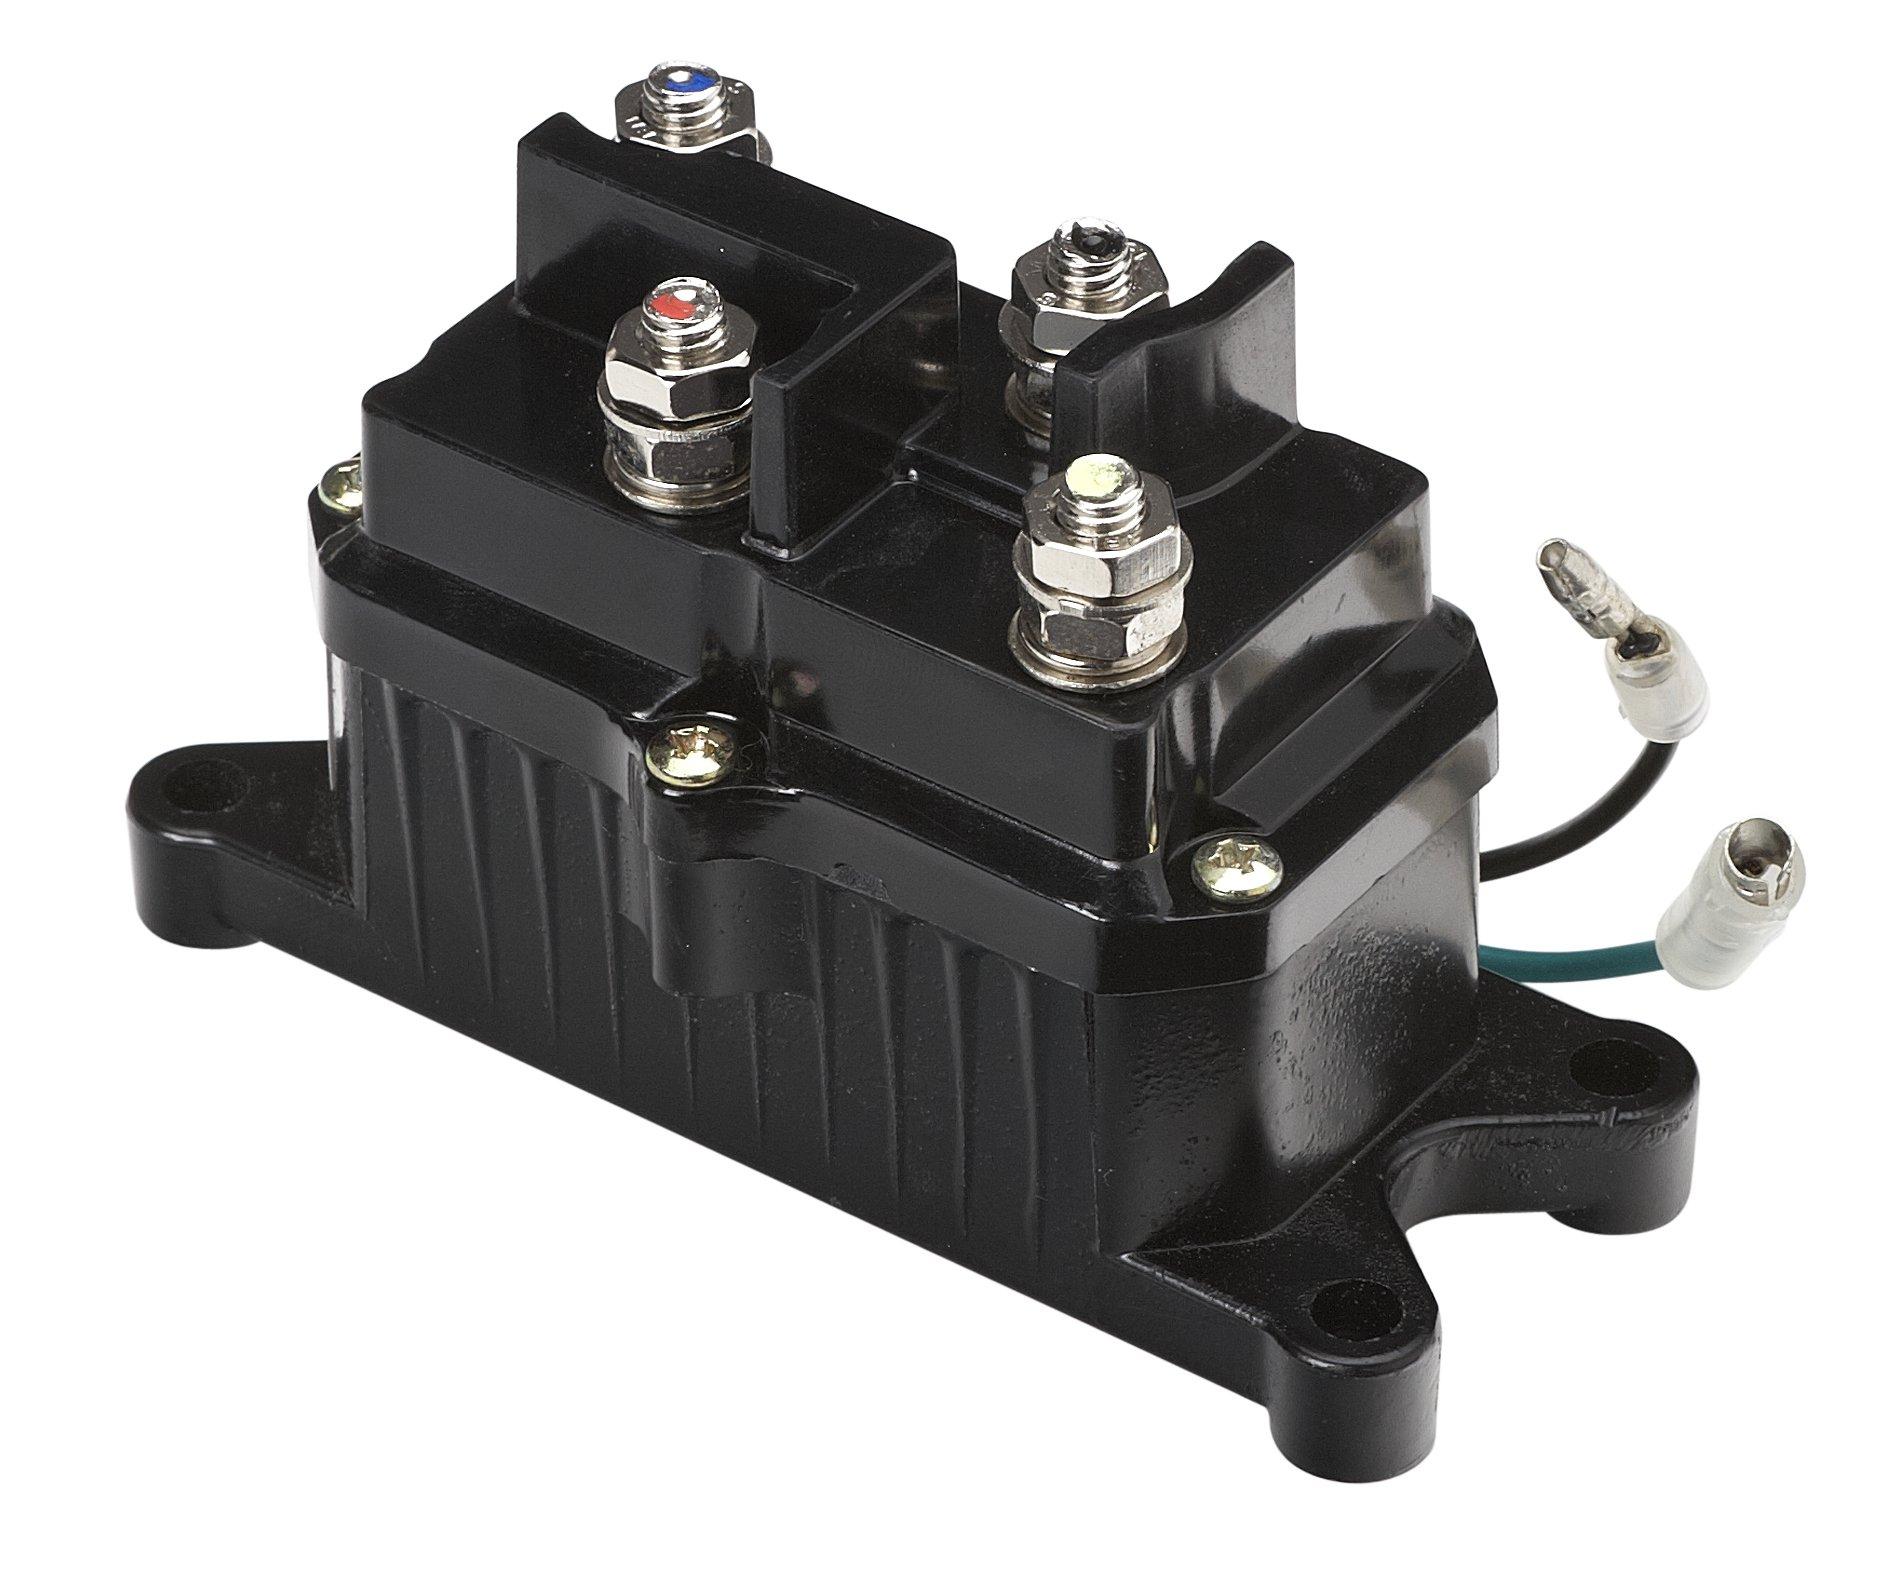 Sedeta ATV Handlebars Replacement Winch Mini Rocker Waterproof 3M Cable Winches Switch